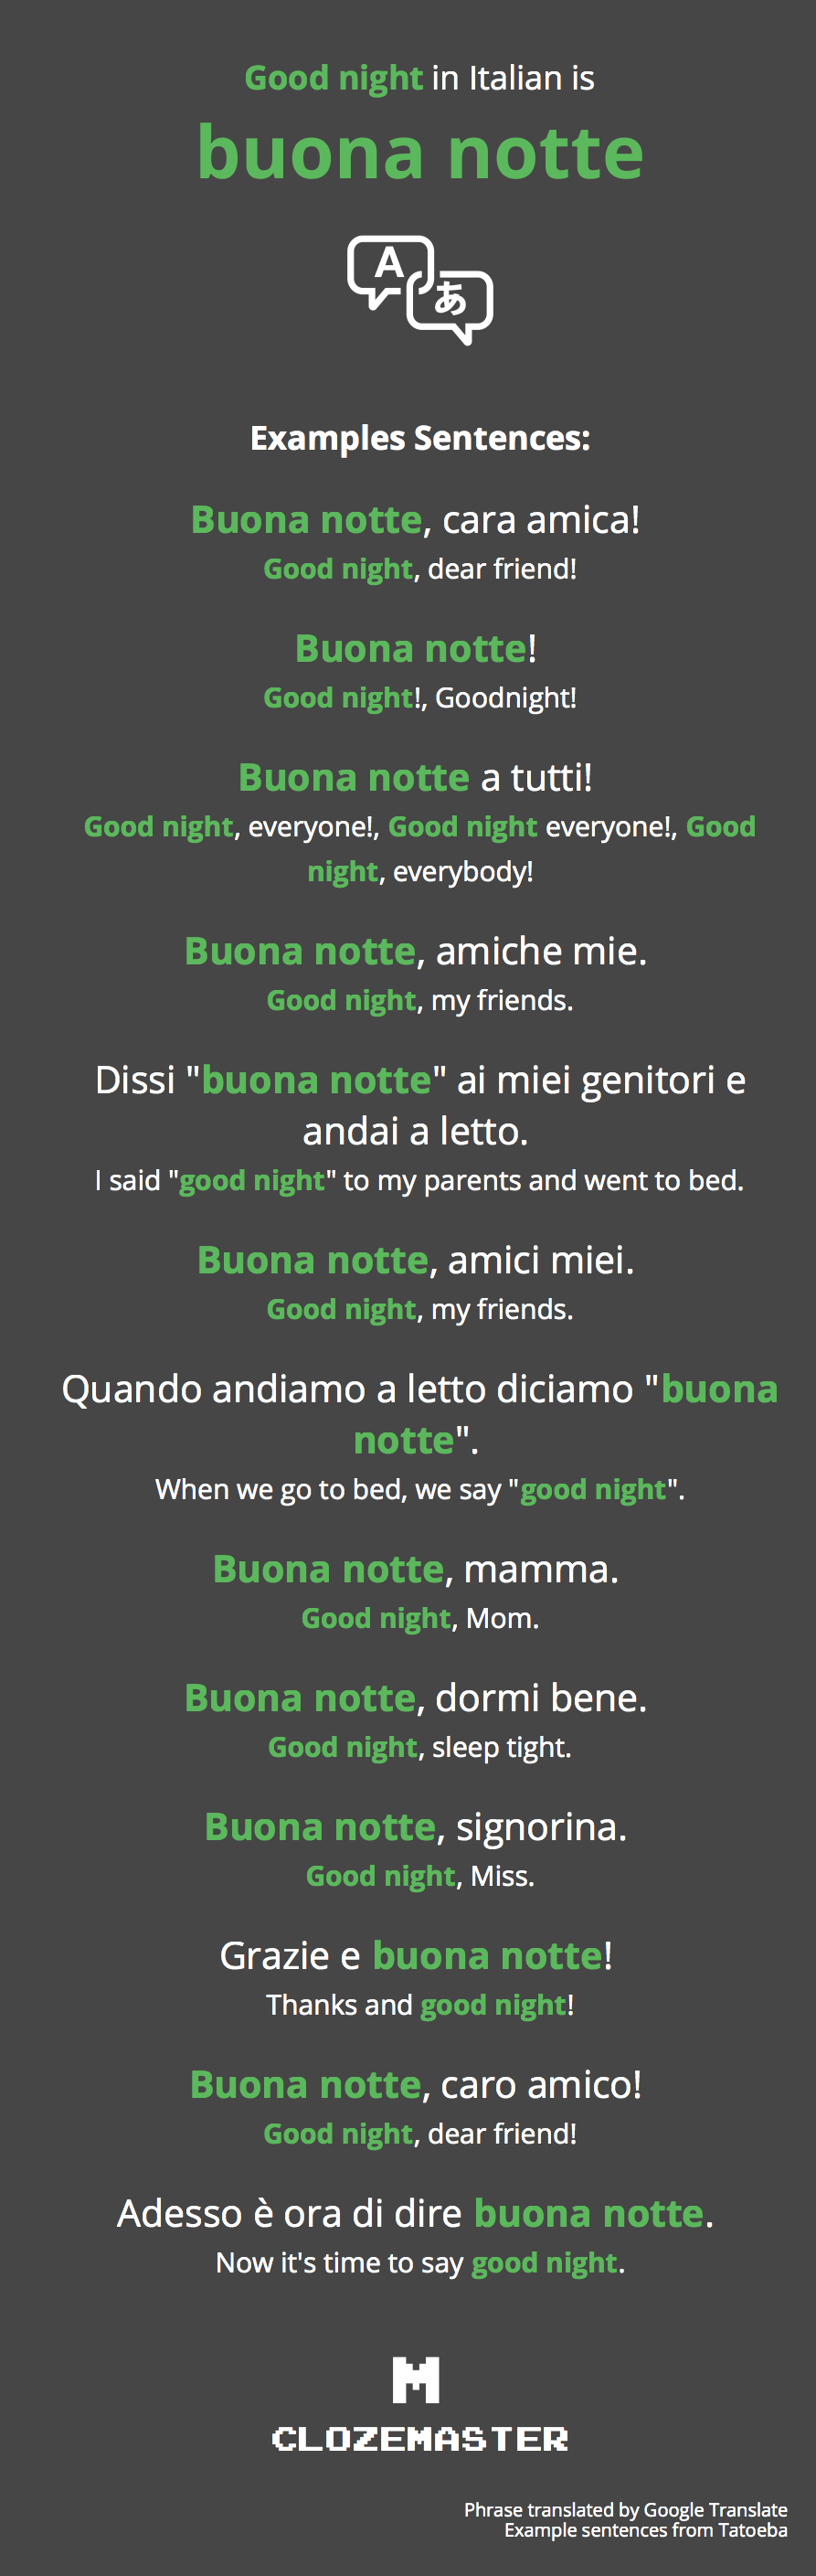 How to Say Good night in Italian - Clozemaster